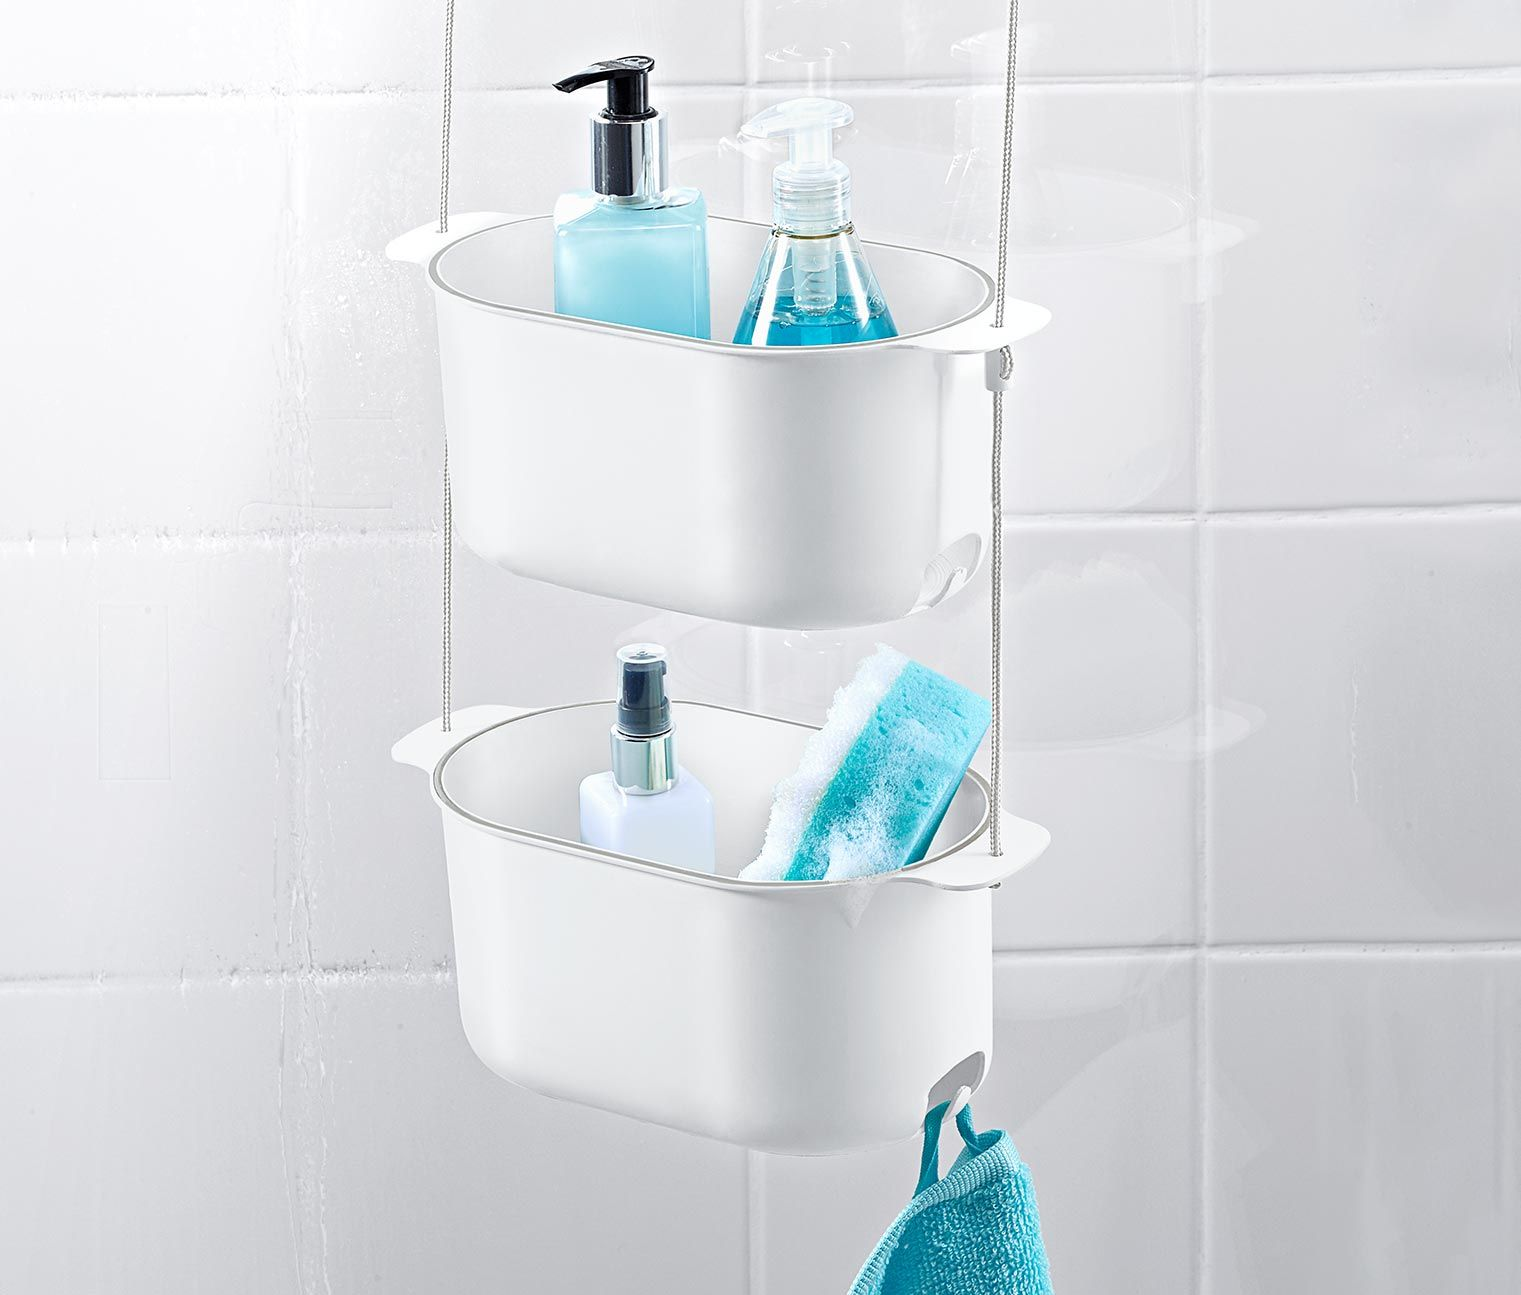 Závesná polička do sprchy  Dusch hängeregal, Duschbadewanne